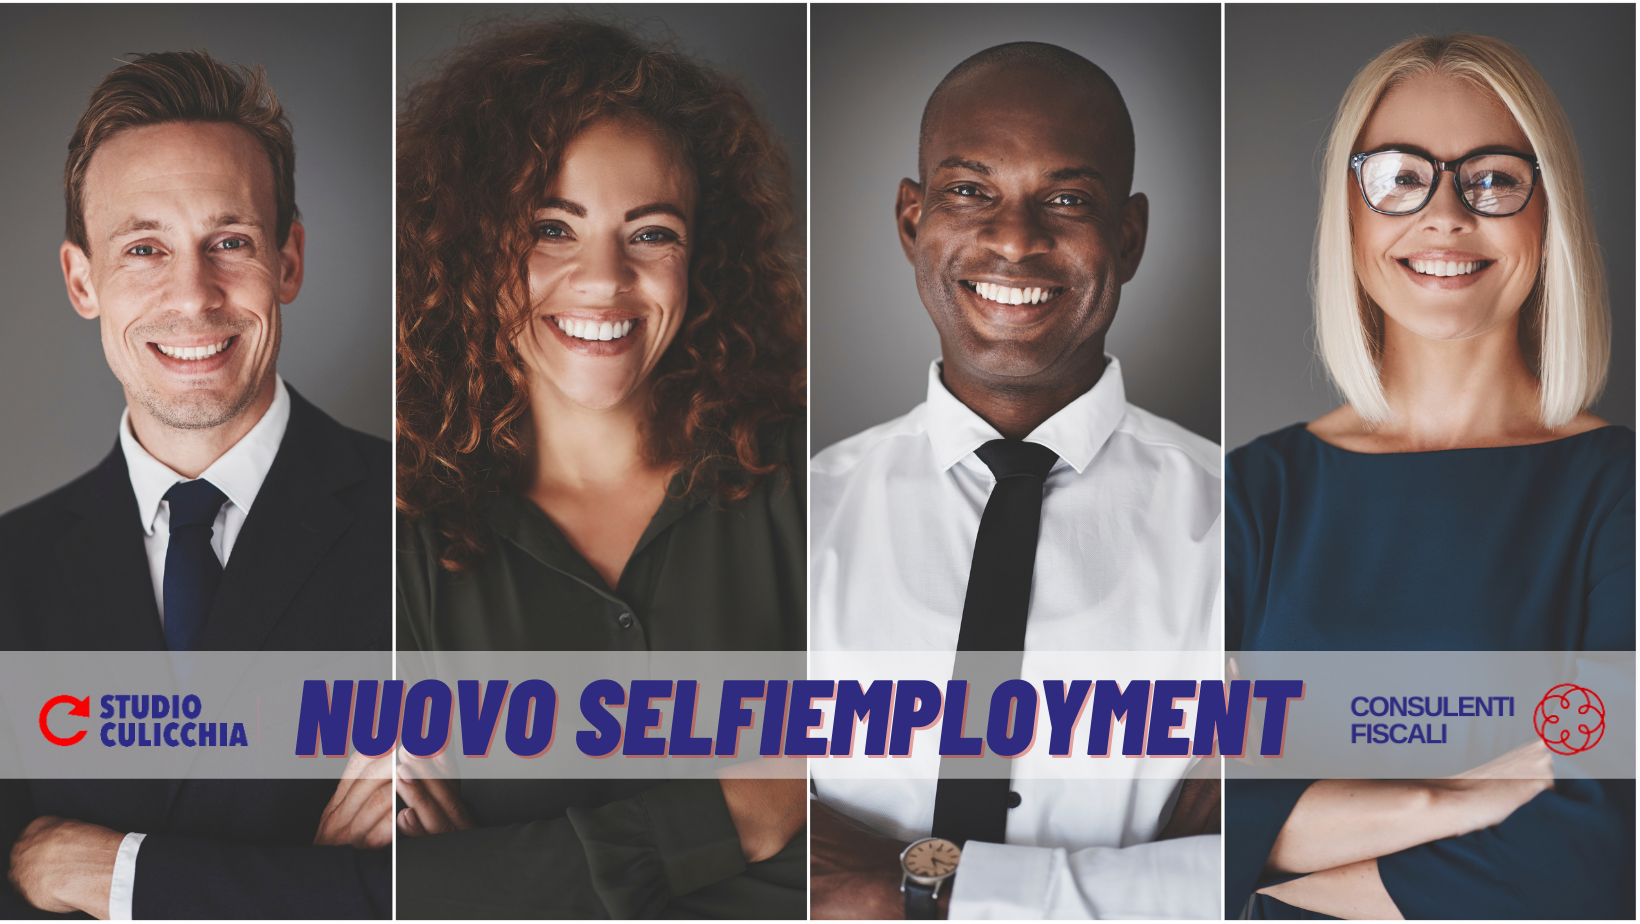 nuovo selfiemployment